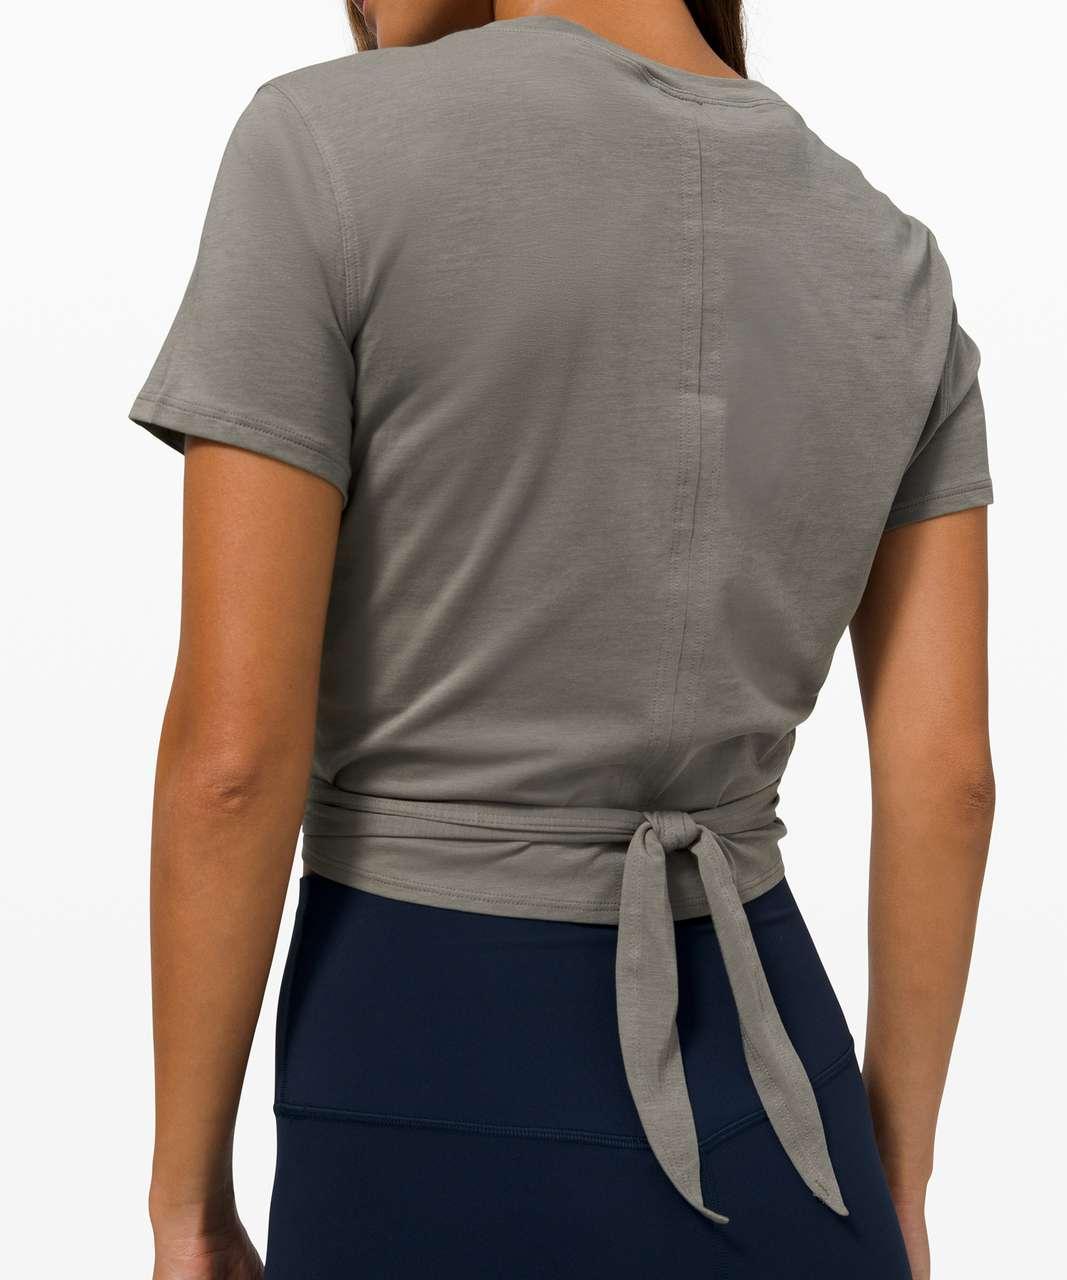 Lululemon Time To Restore Short Sleeve - Grey Sage